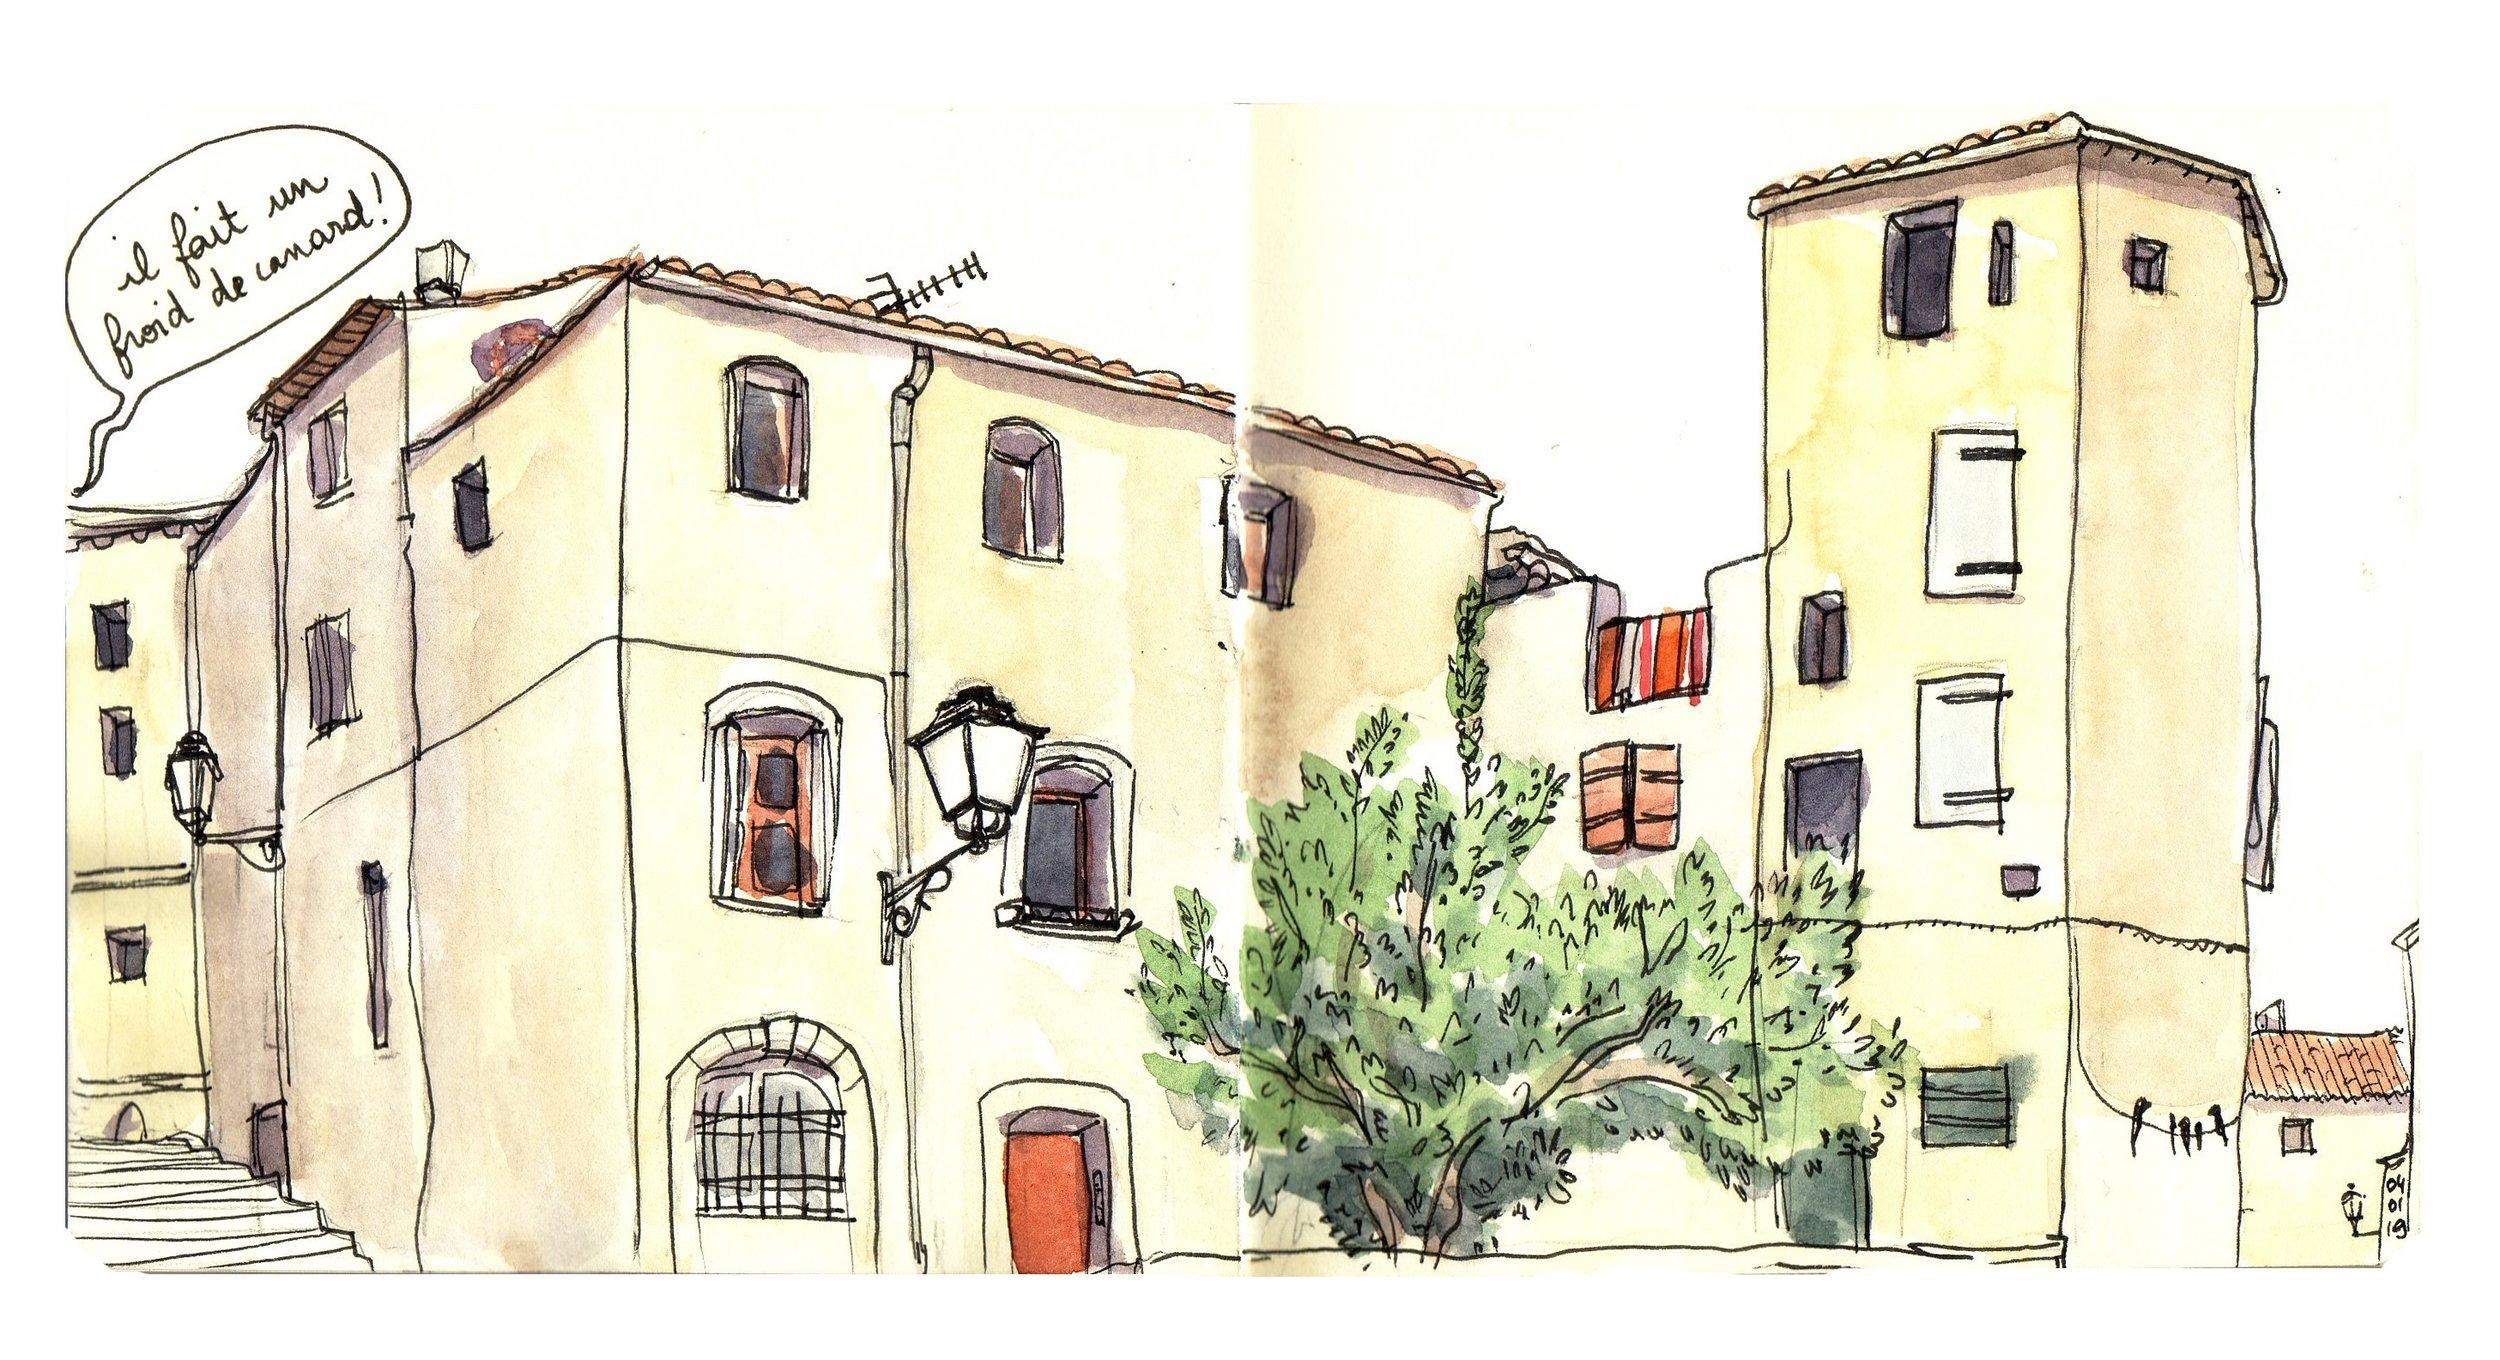 Atelier_petites_rues_petites_places.jpg